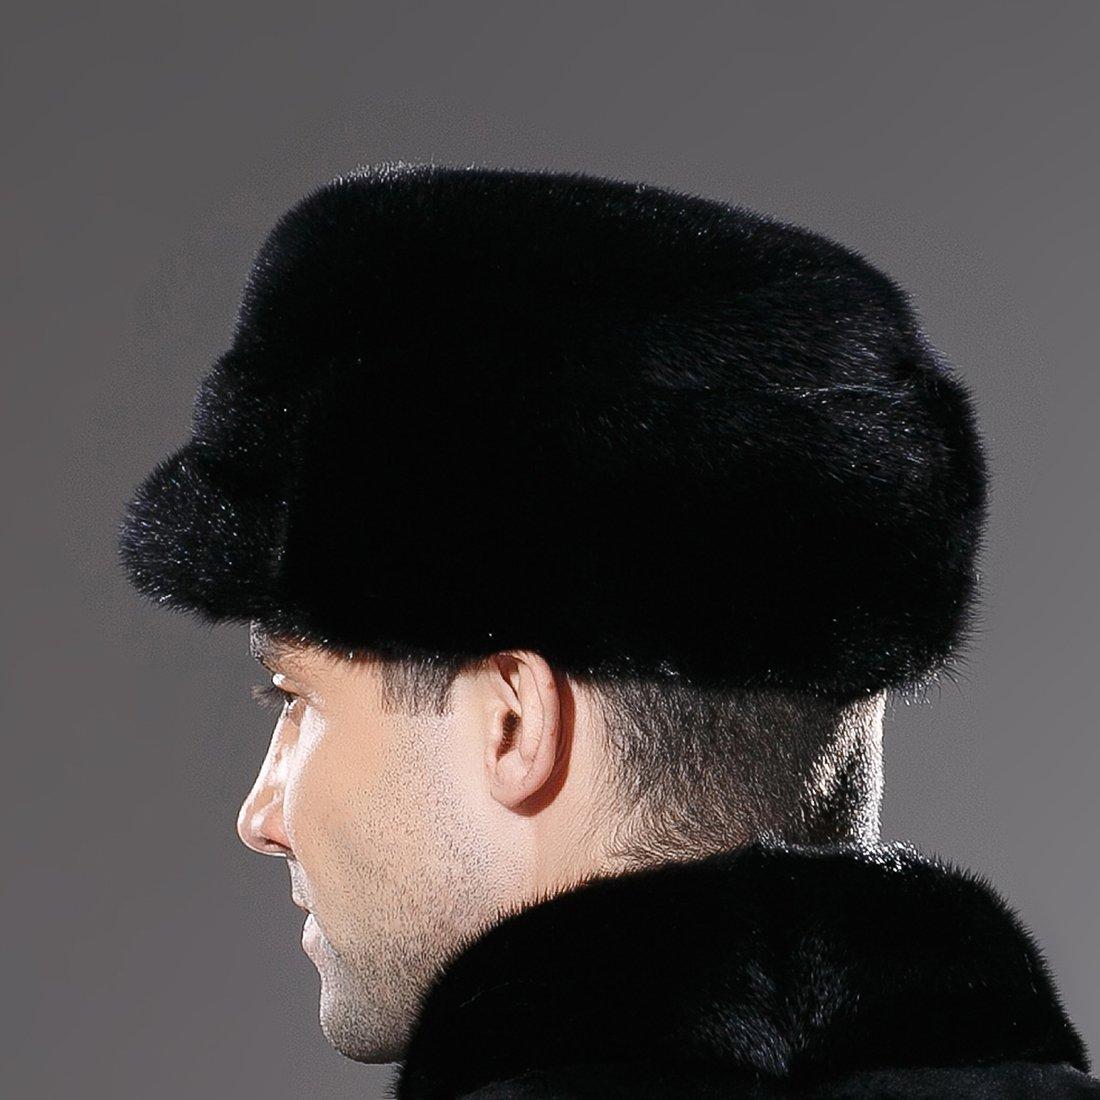 URSFUR Mne's Winter Fur Cap Genuine Mink Fur Fudd Hat Black M by URSFUR (Image #6)